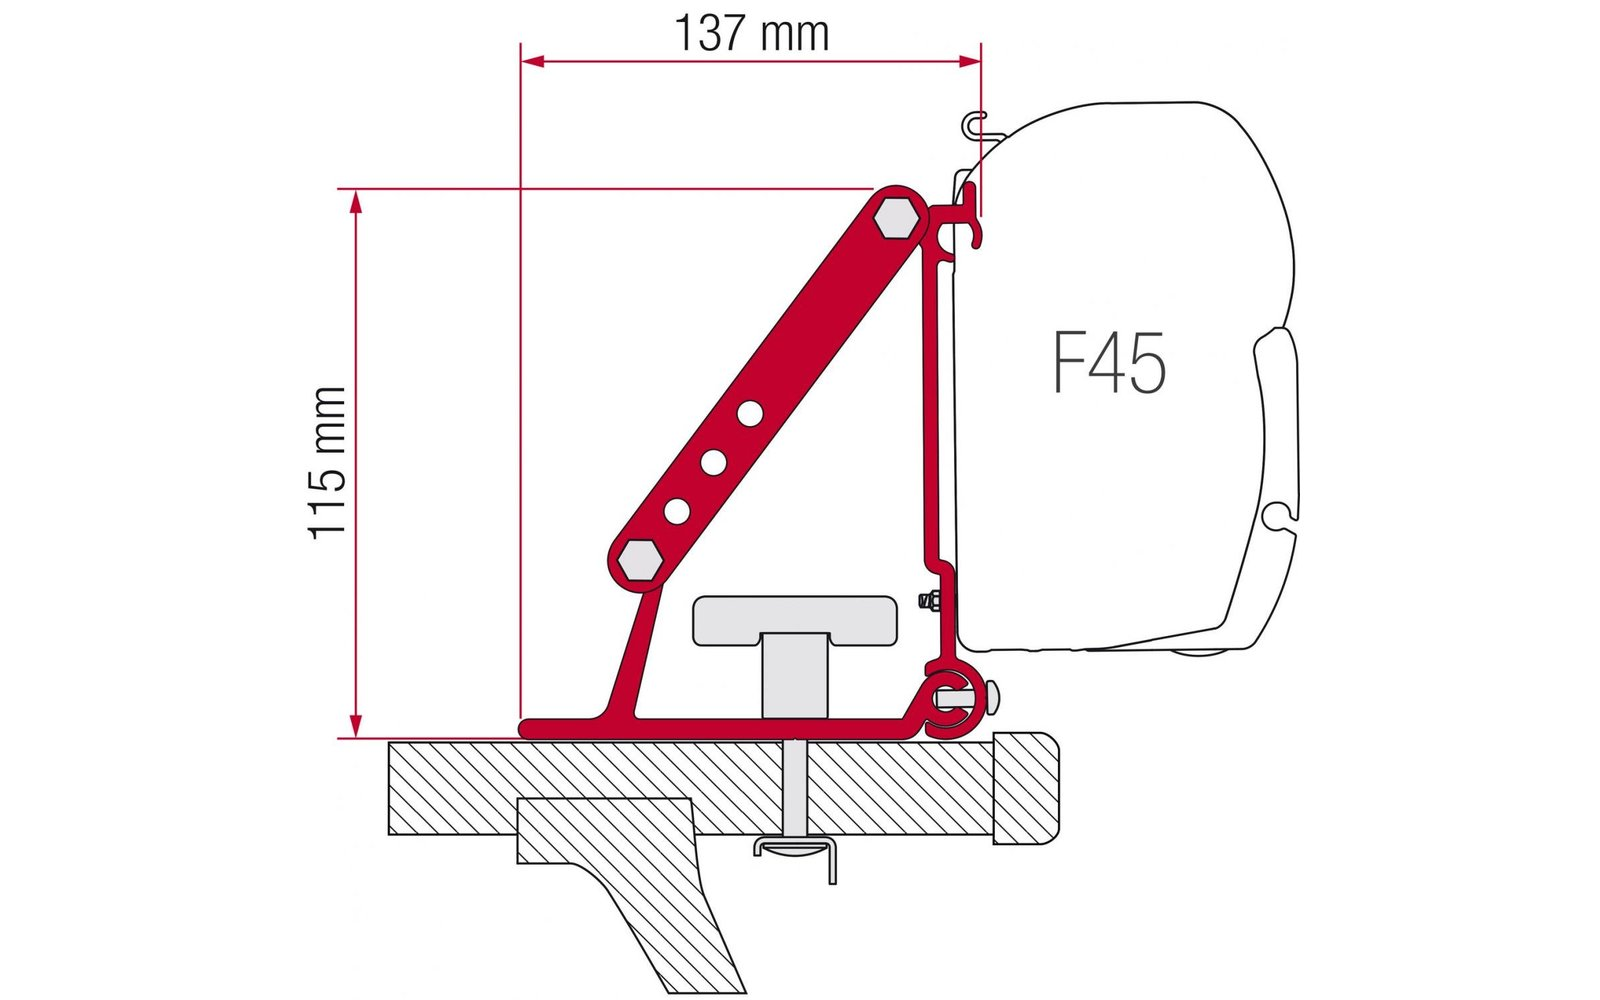 Halterungen F45 Dachmontage Fritz Berger Campingbedarf